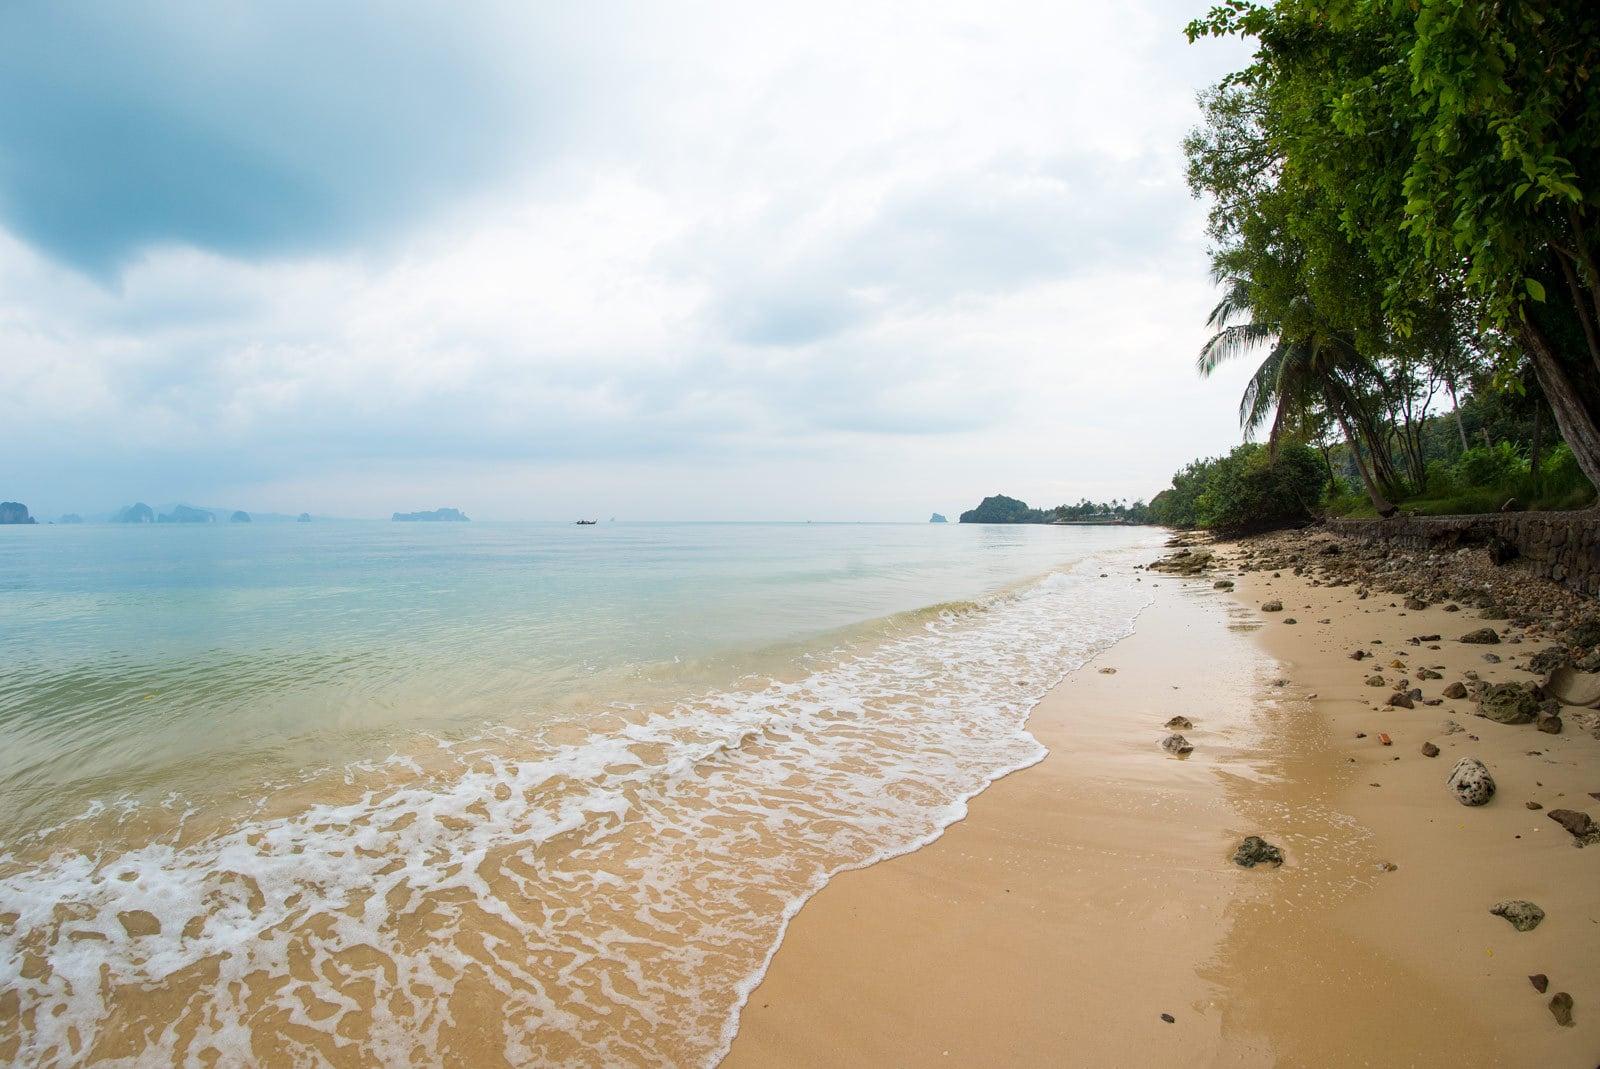 Einsamer Strand in Ko Yao Noi